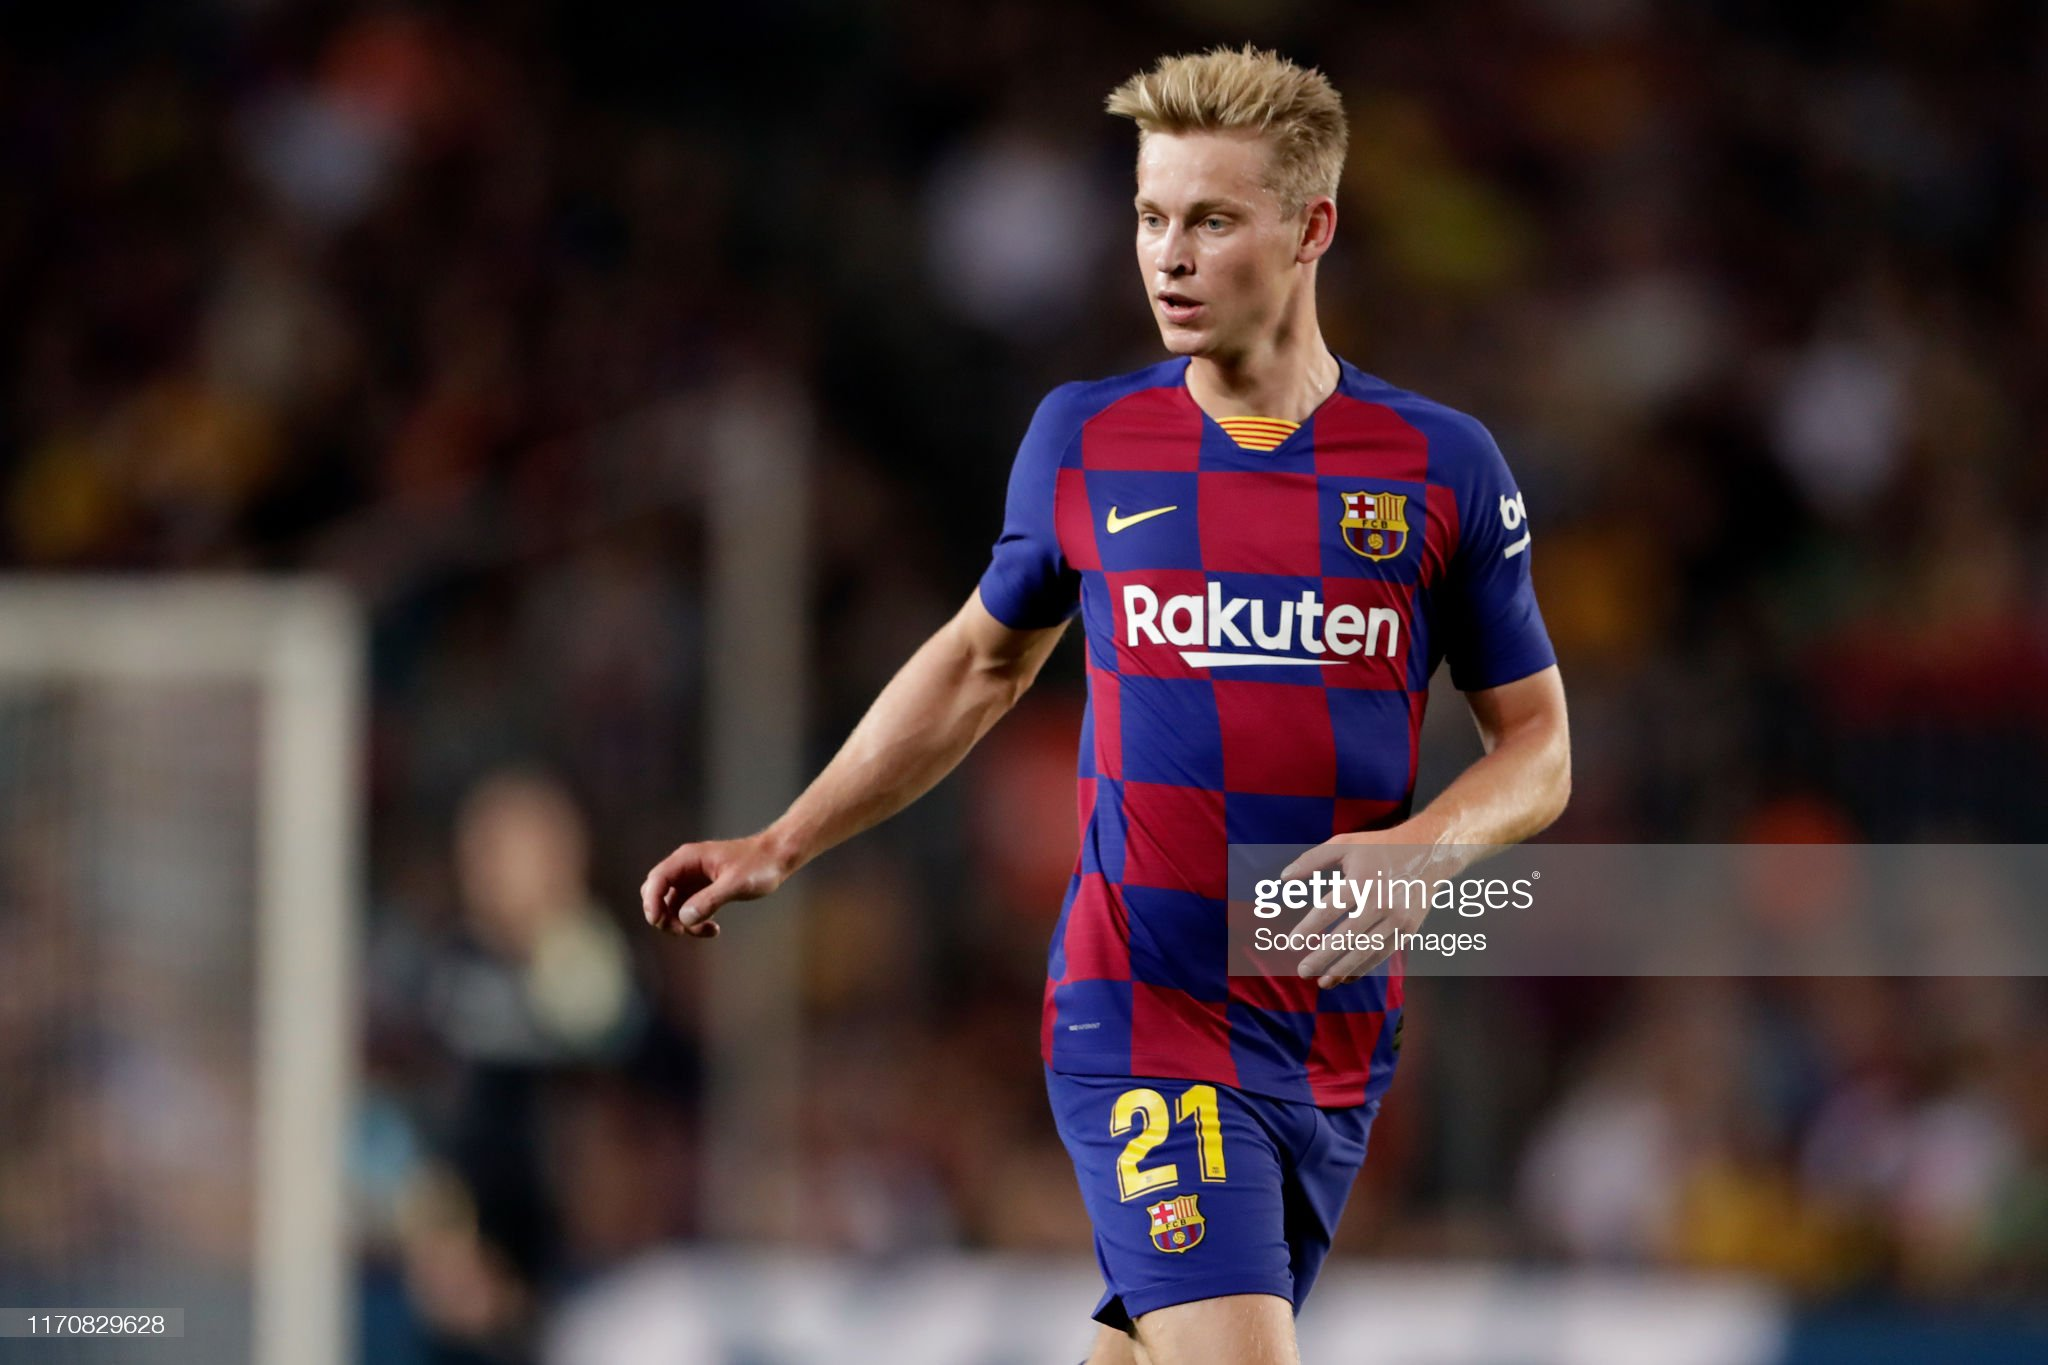 صور مباراة : برشلونة - فياريال 2-1 ( 24-09-2019 )  Frenkie-de-jong-of-fc-barcelona-during-the-la-liga-santander-match-picture-id1170829628?s=2048x2048